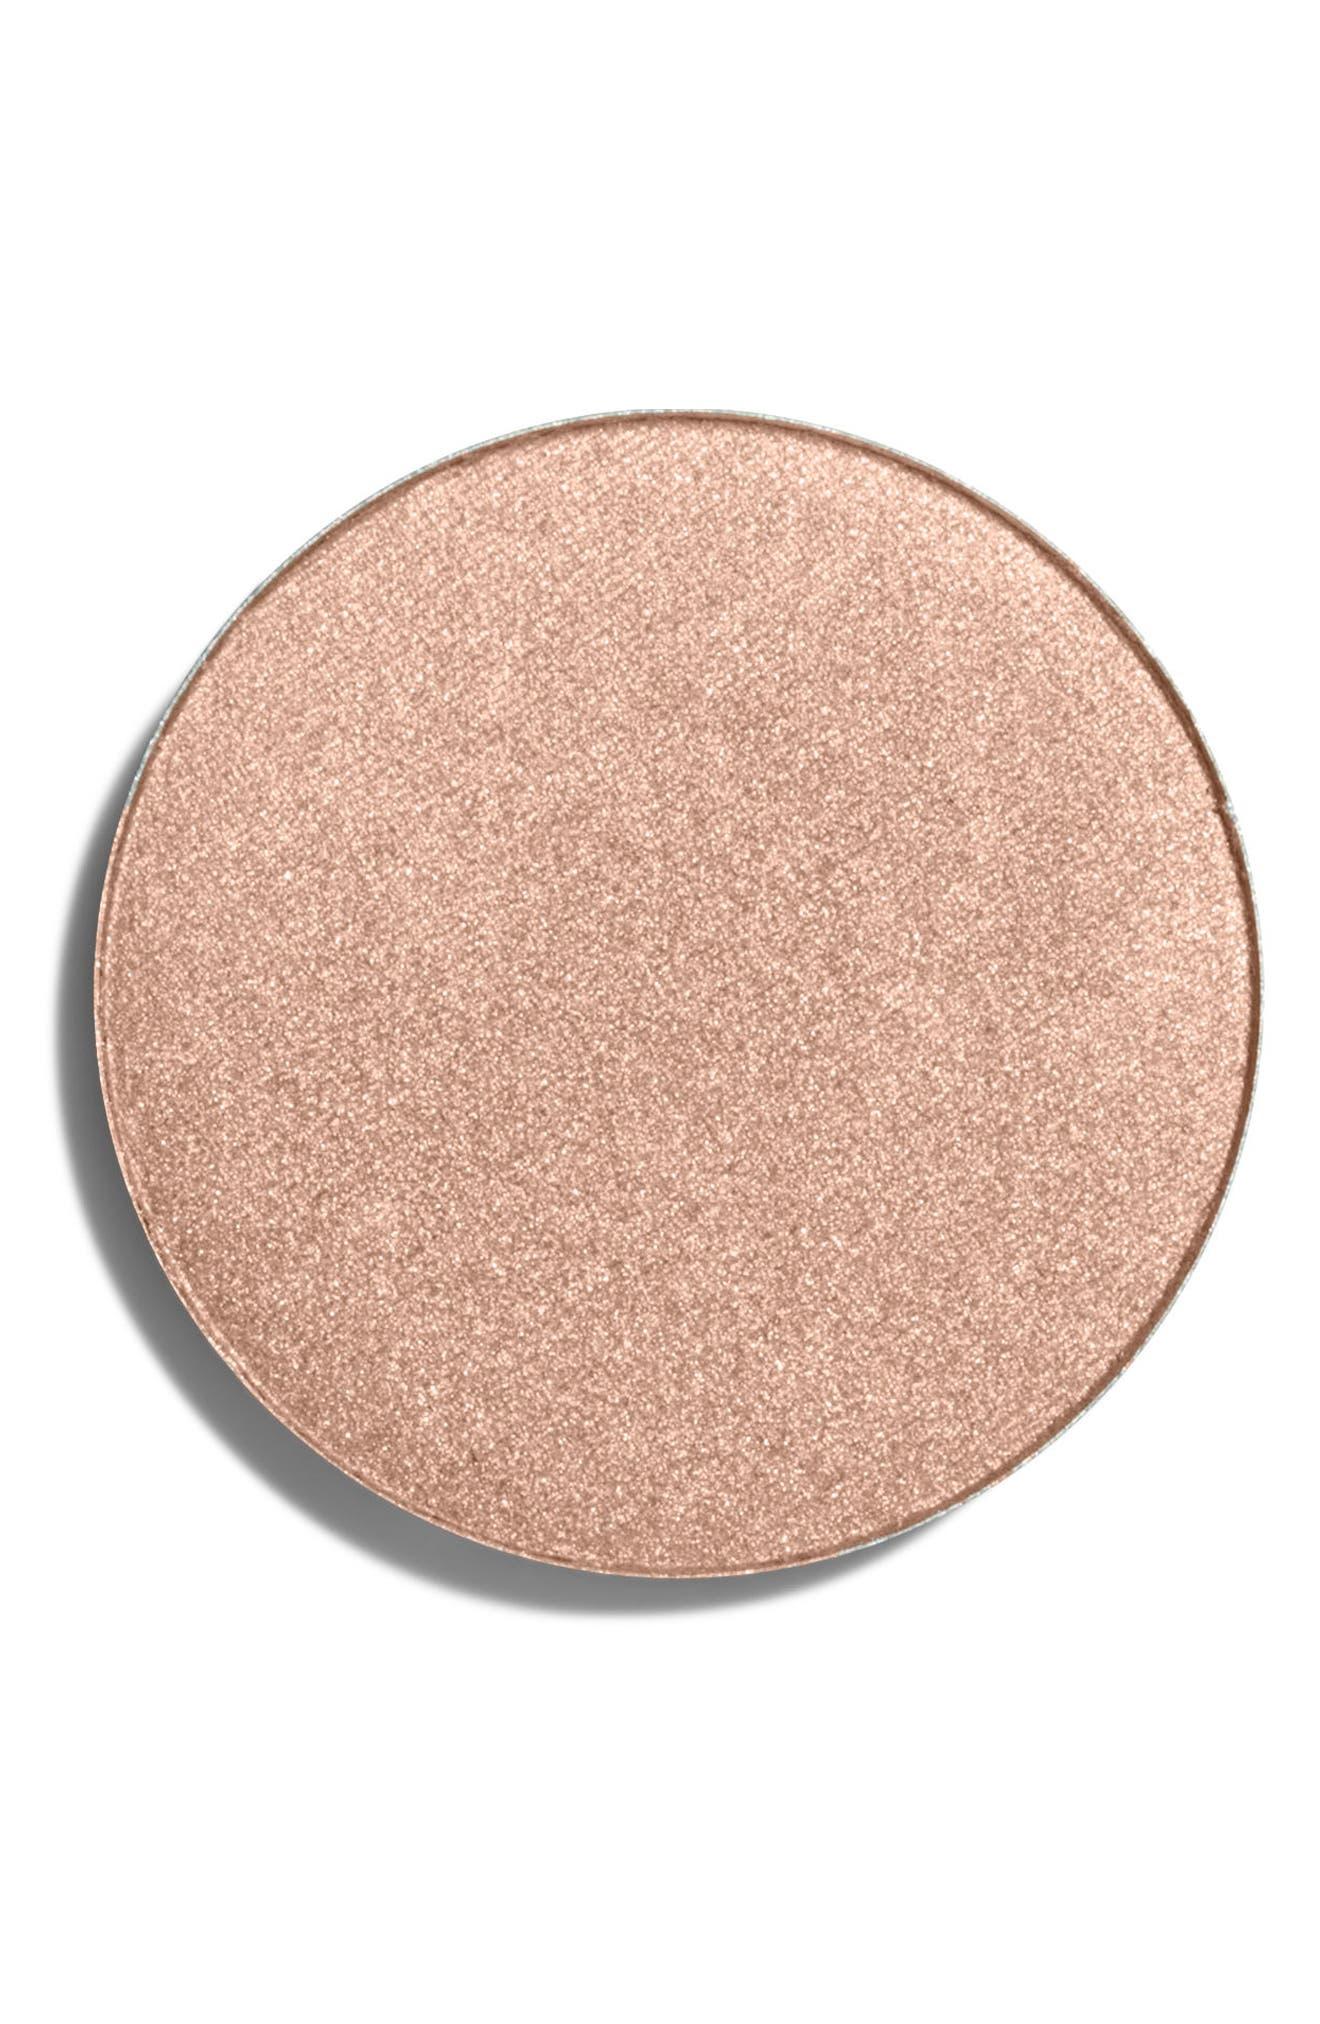 Iridescent Eye Shade Refill,                         Main,                         color, Rose Gold